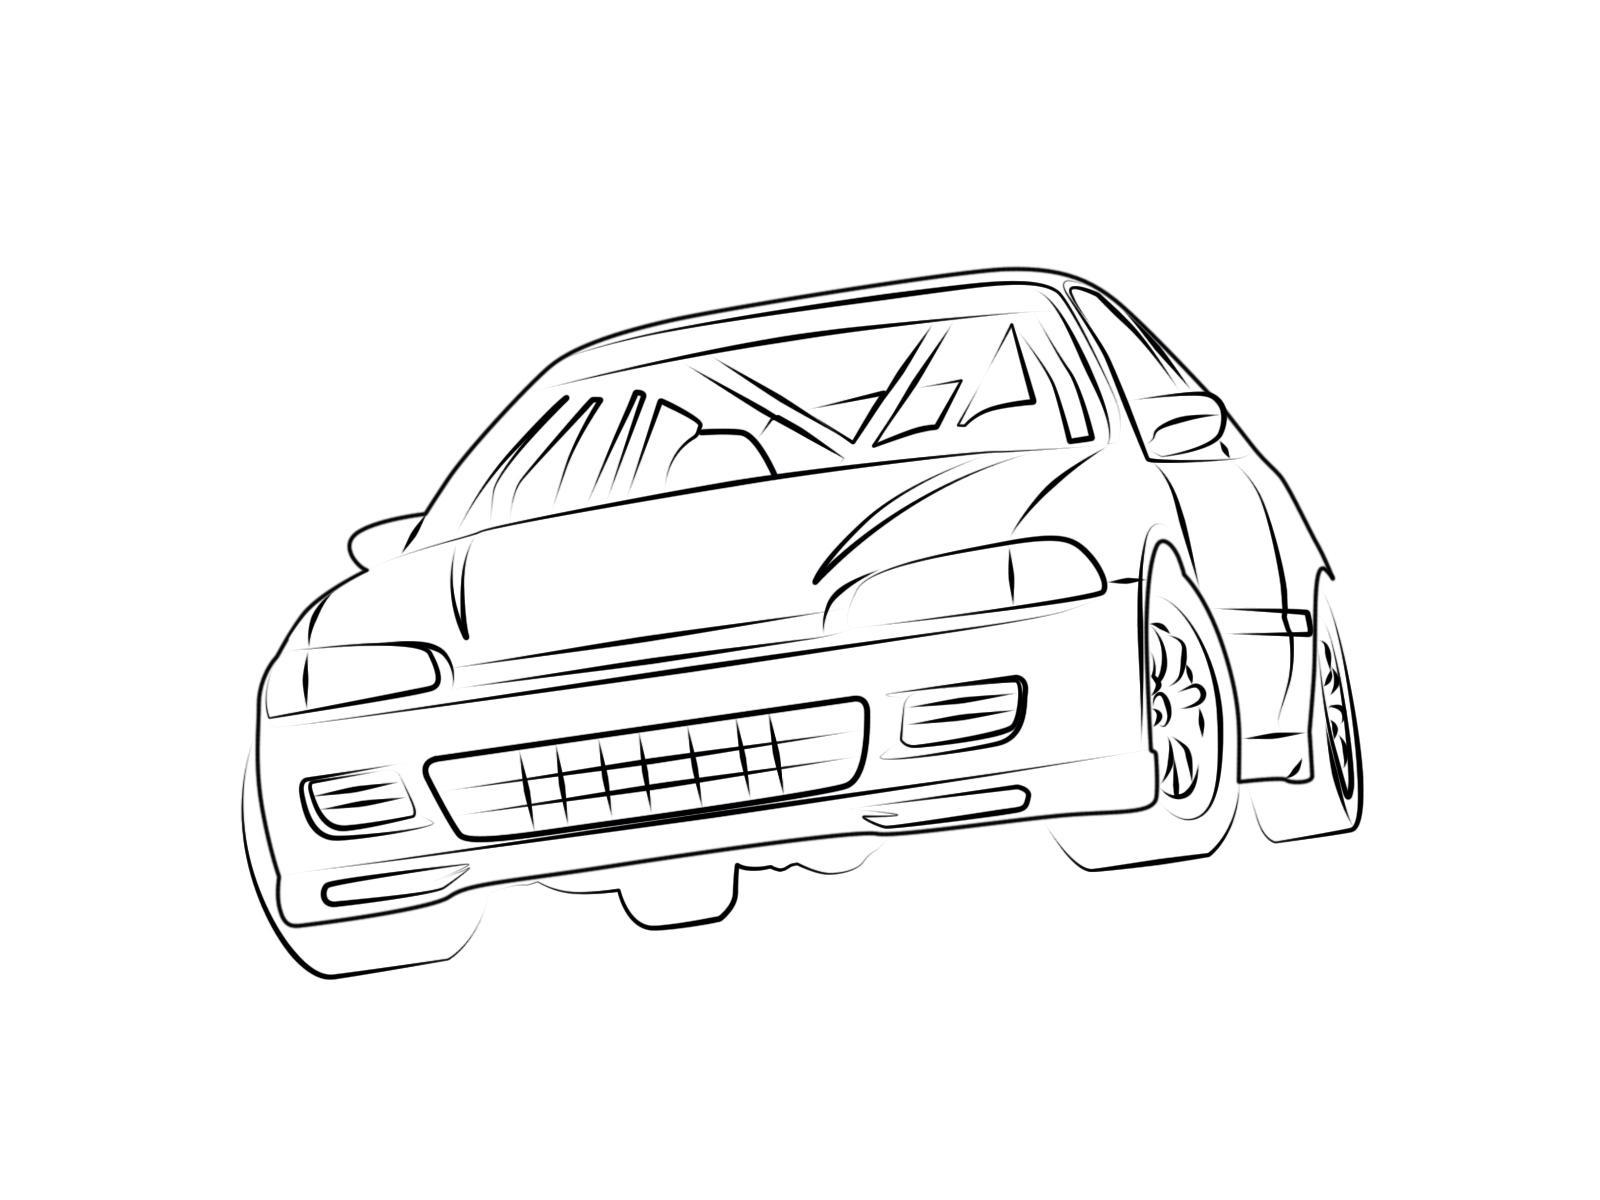 Honda Civic Eg By Gboyd On Deviantart